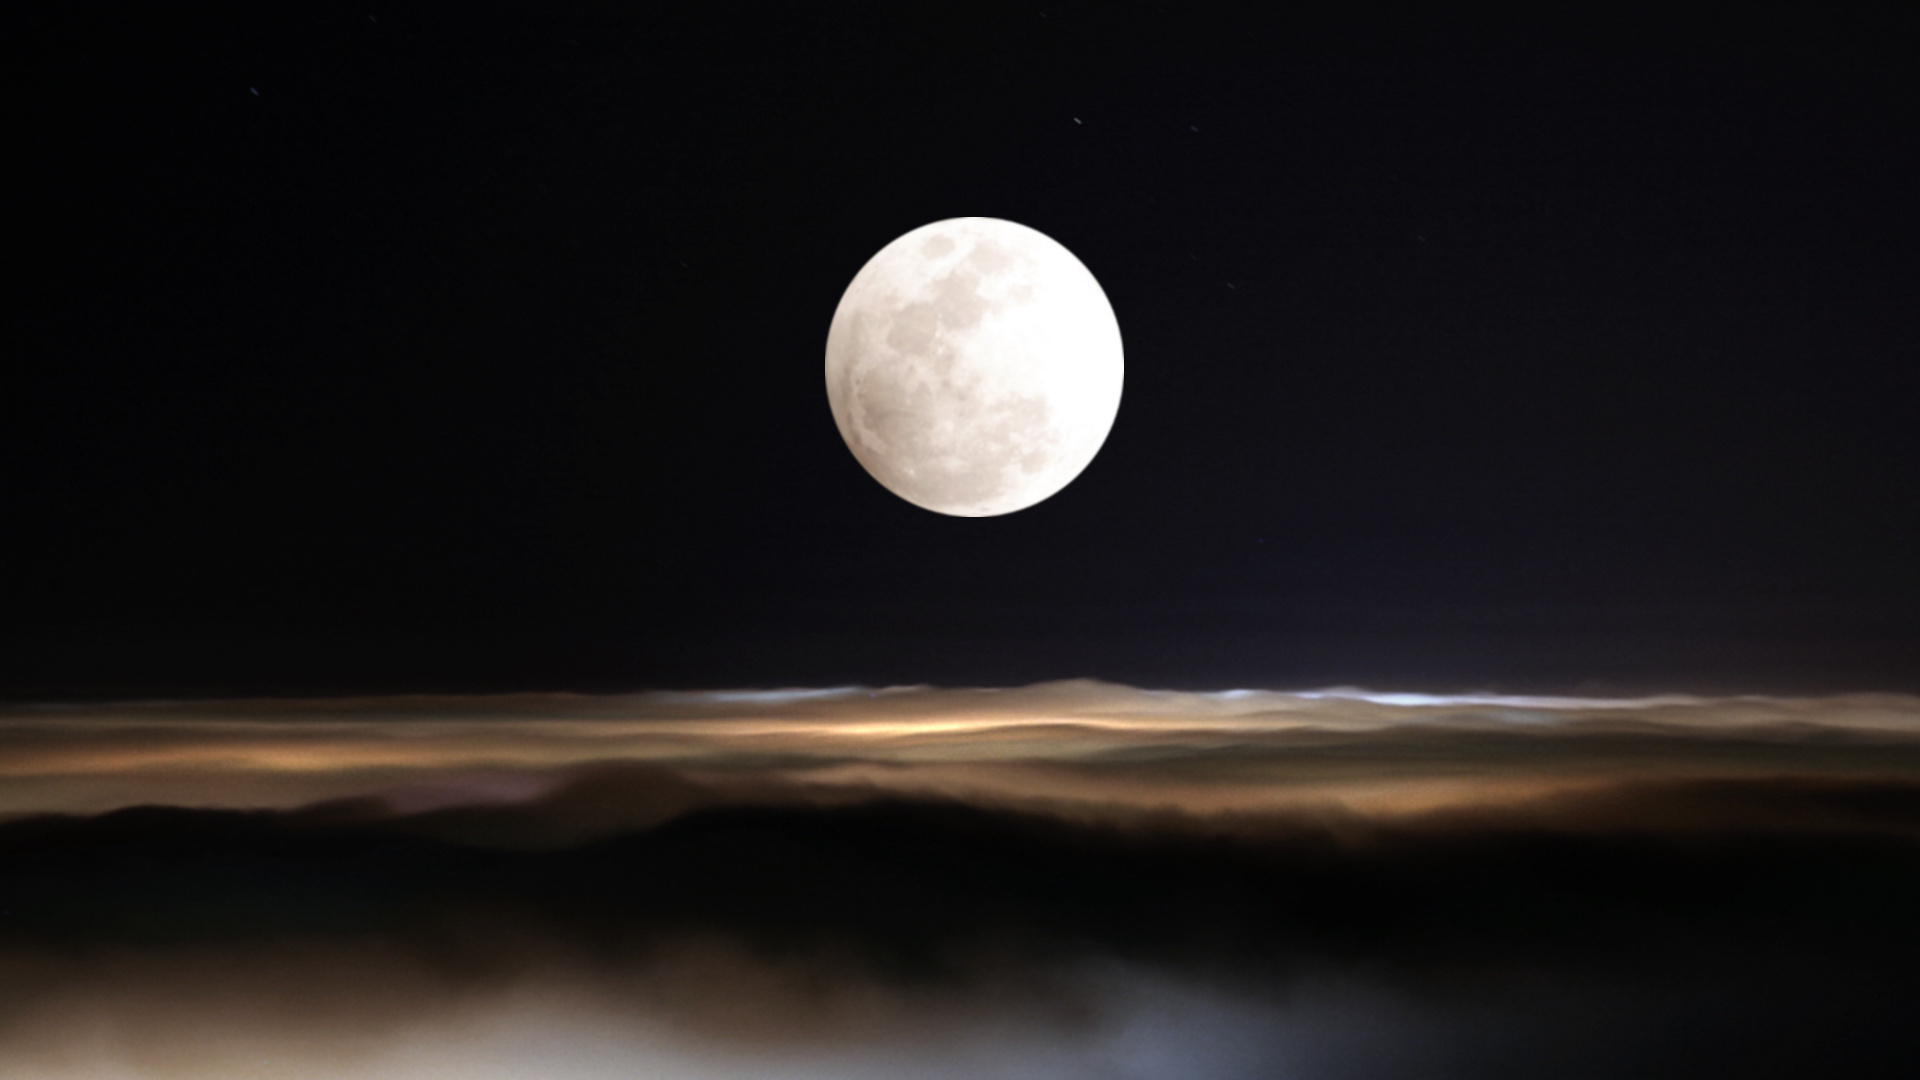 night sky hd wallpaper iphone 6